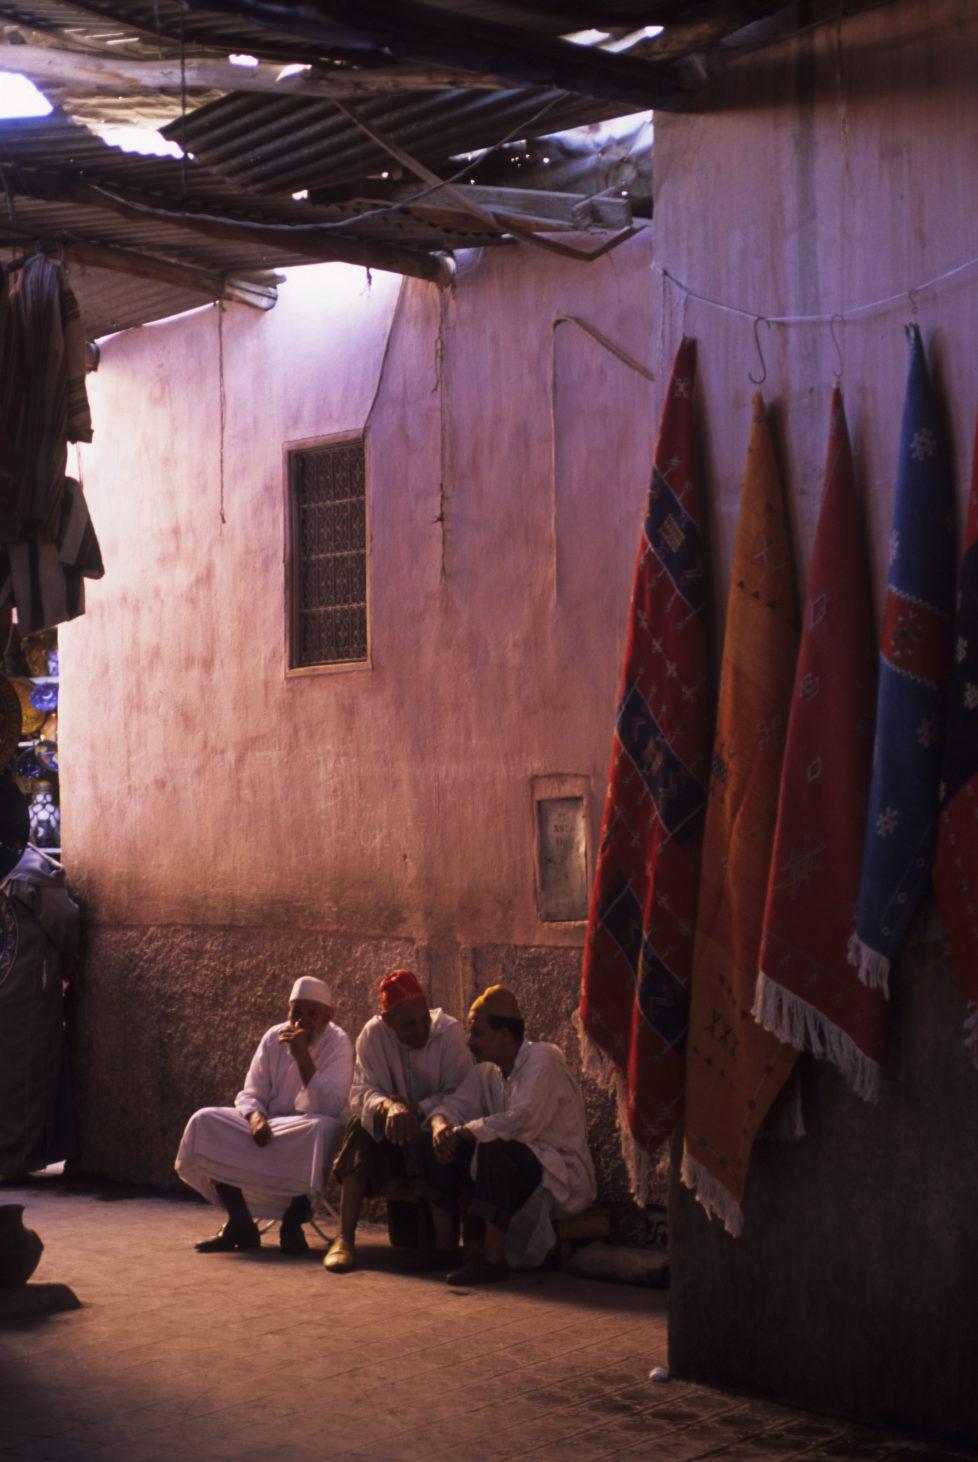 MOROCCO - 2001/01/01: Morocco, Marrakech, Souk Scene, Moroccan Men. (Photo by Wolfgang Kaehler/LightRocket via Getty Images)